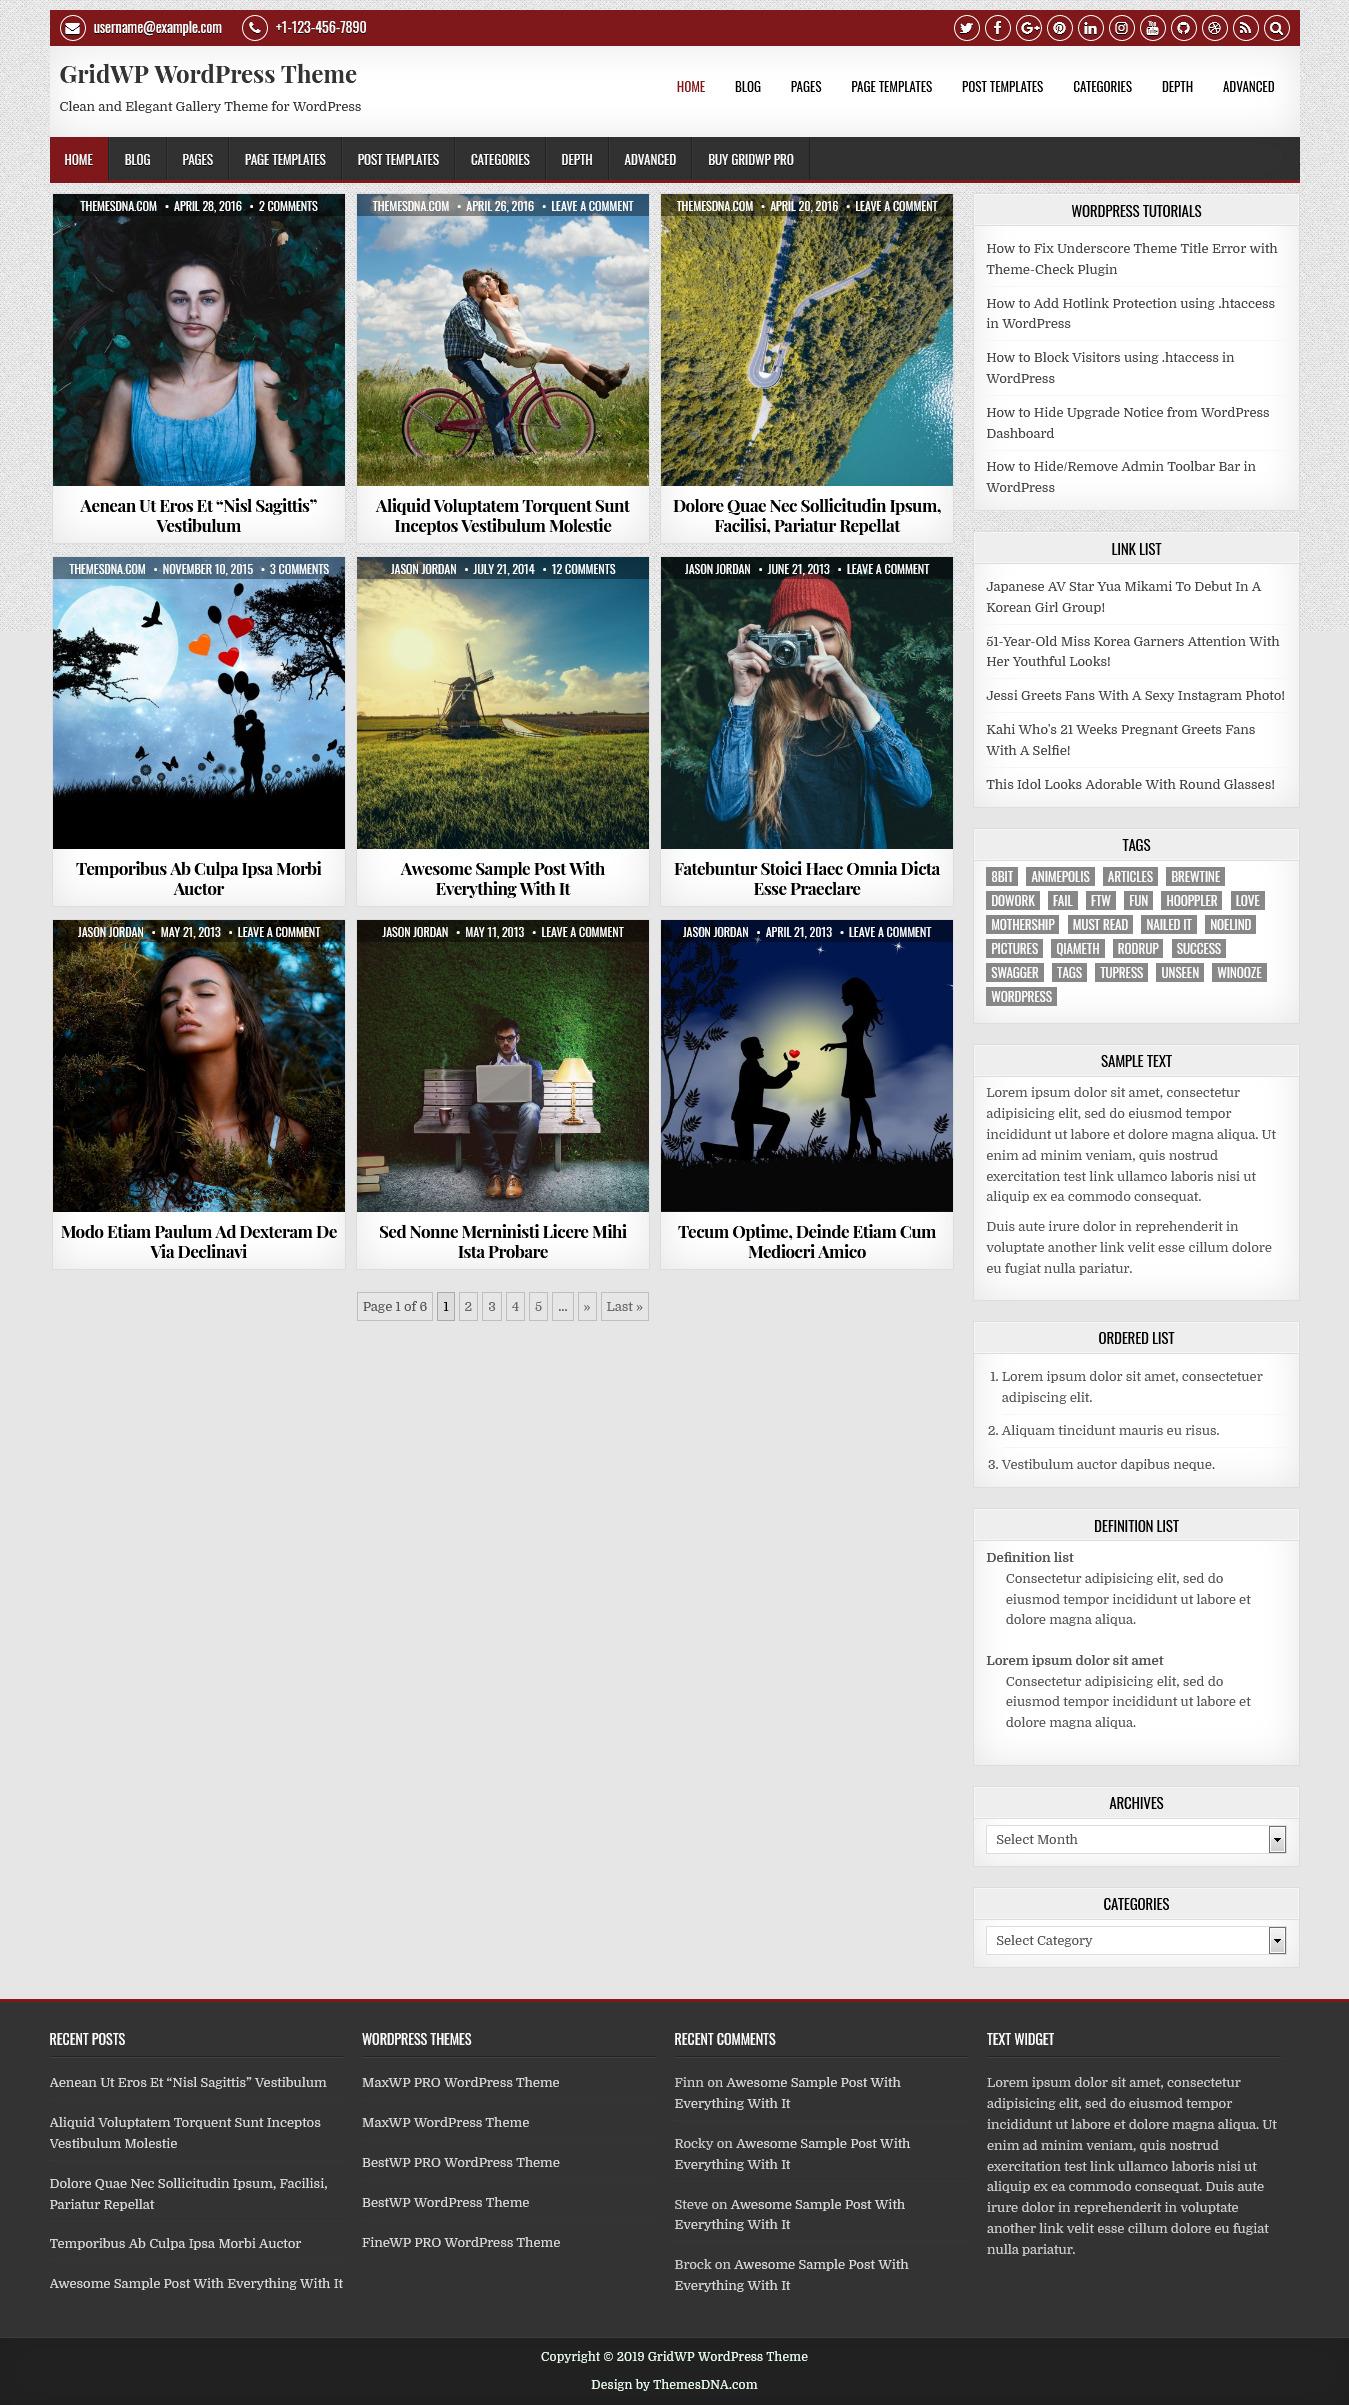 gridwp best free gallery wordpress theme - 10+ Best Free Gallery WordPress Themes